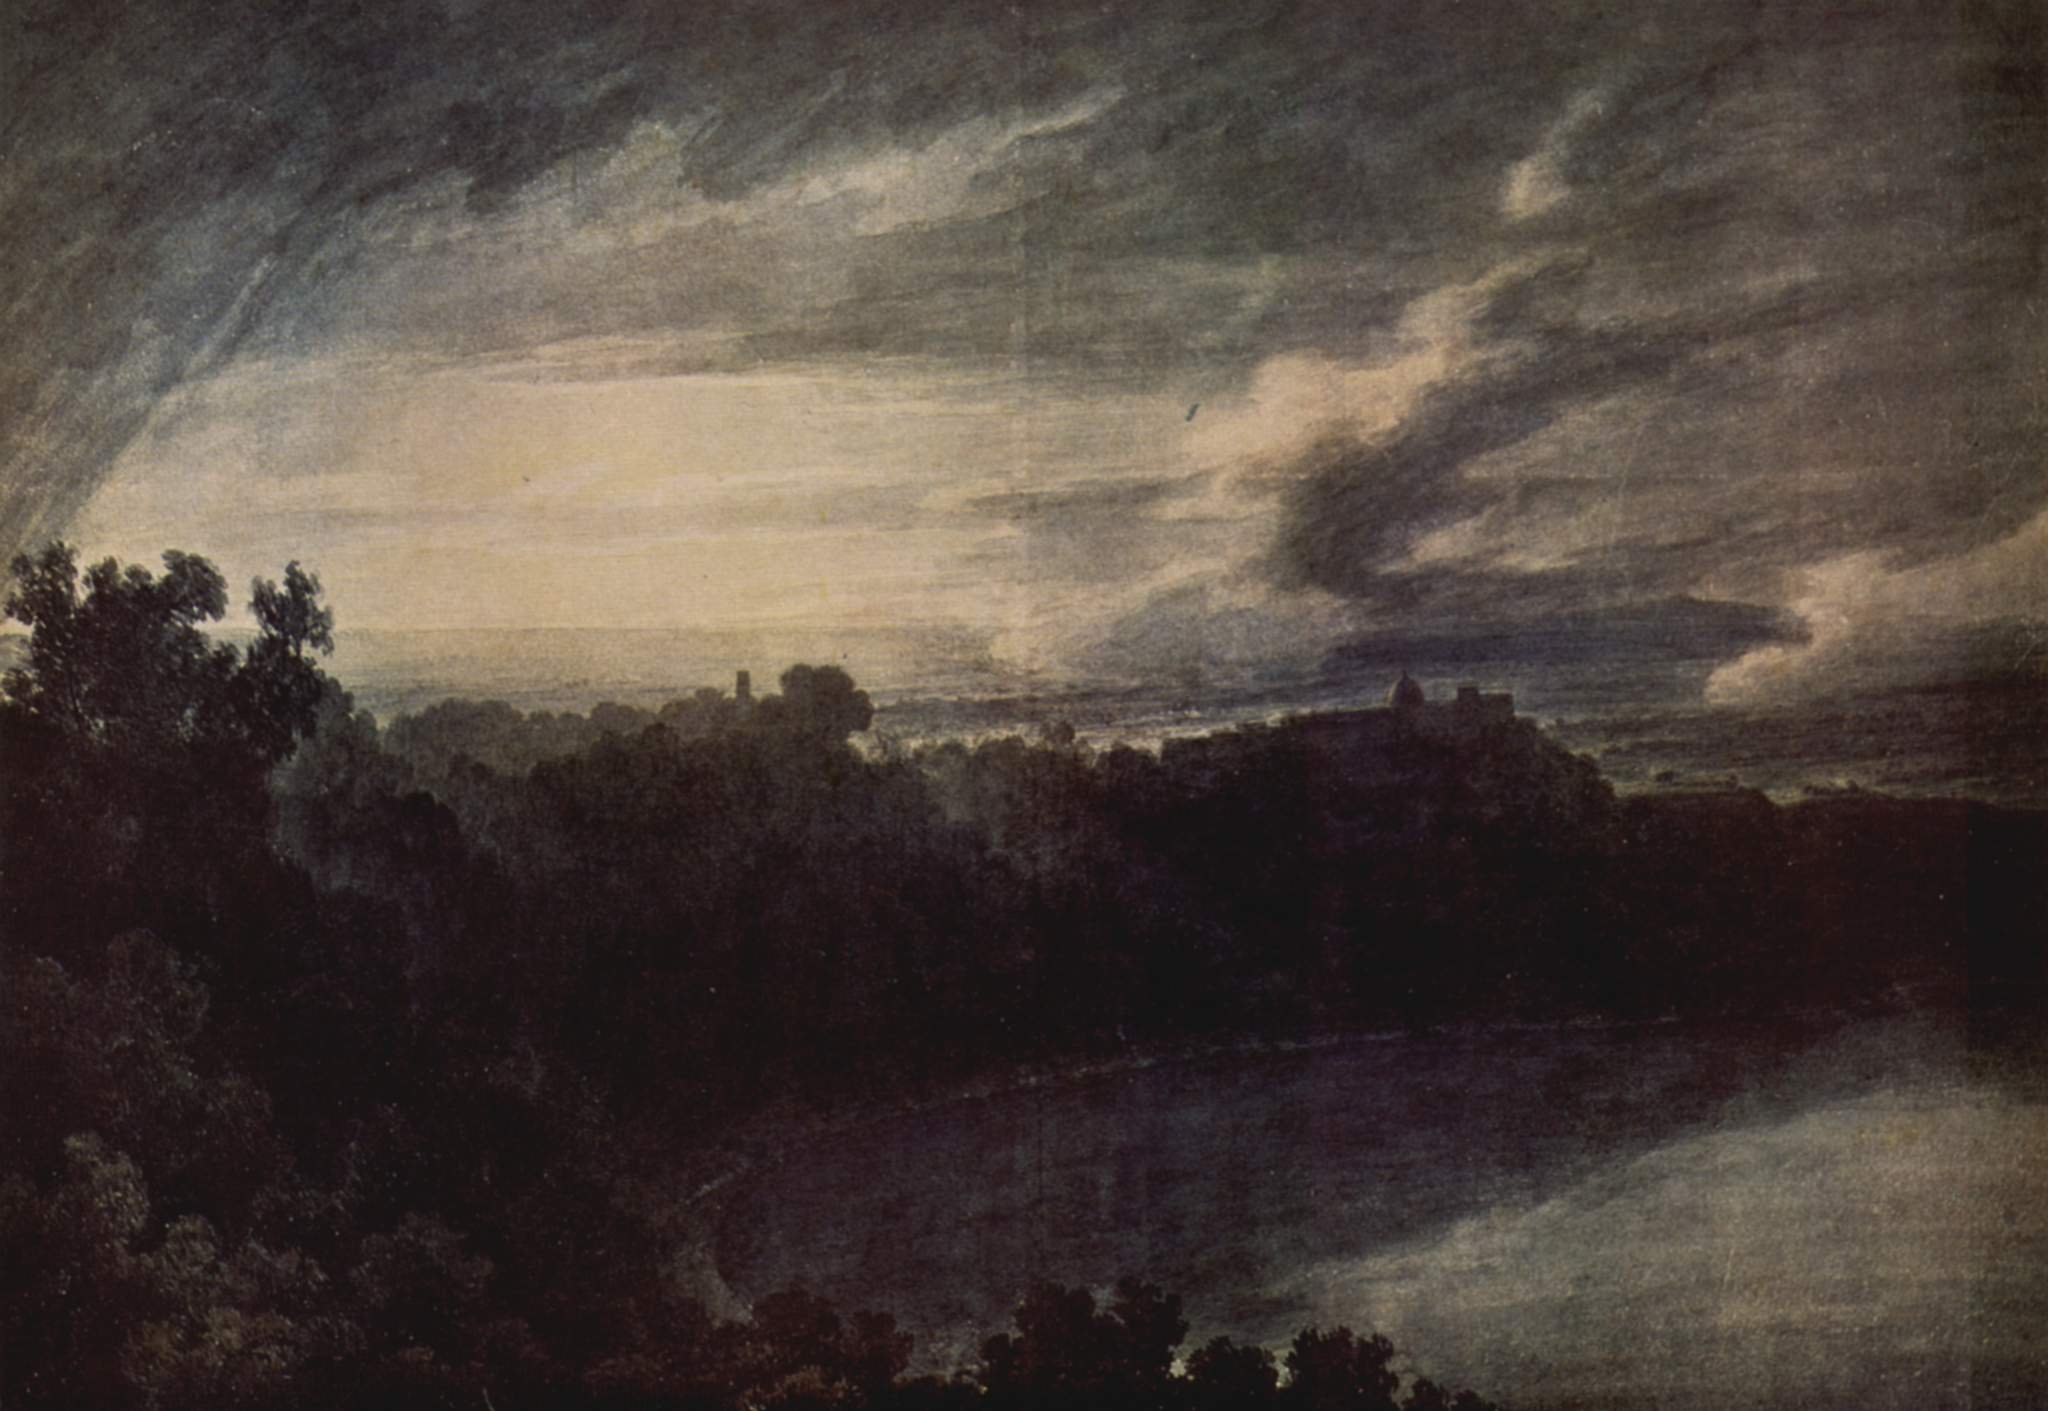 Cozens--Lake-of-Albano-and-Castle-Gandolfo-at-sunset